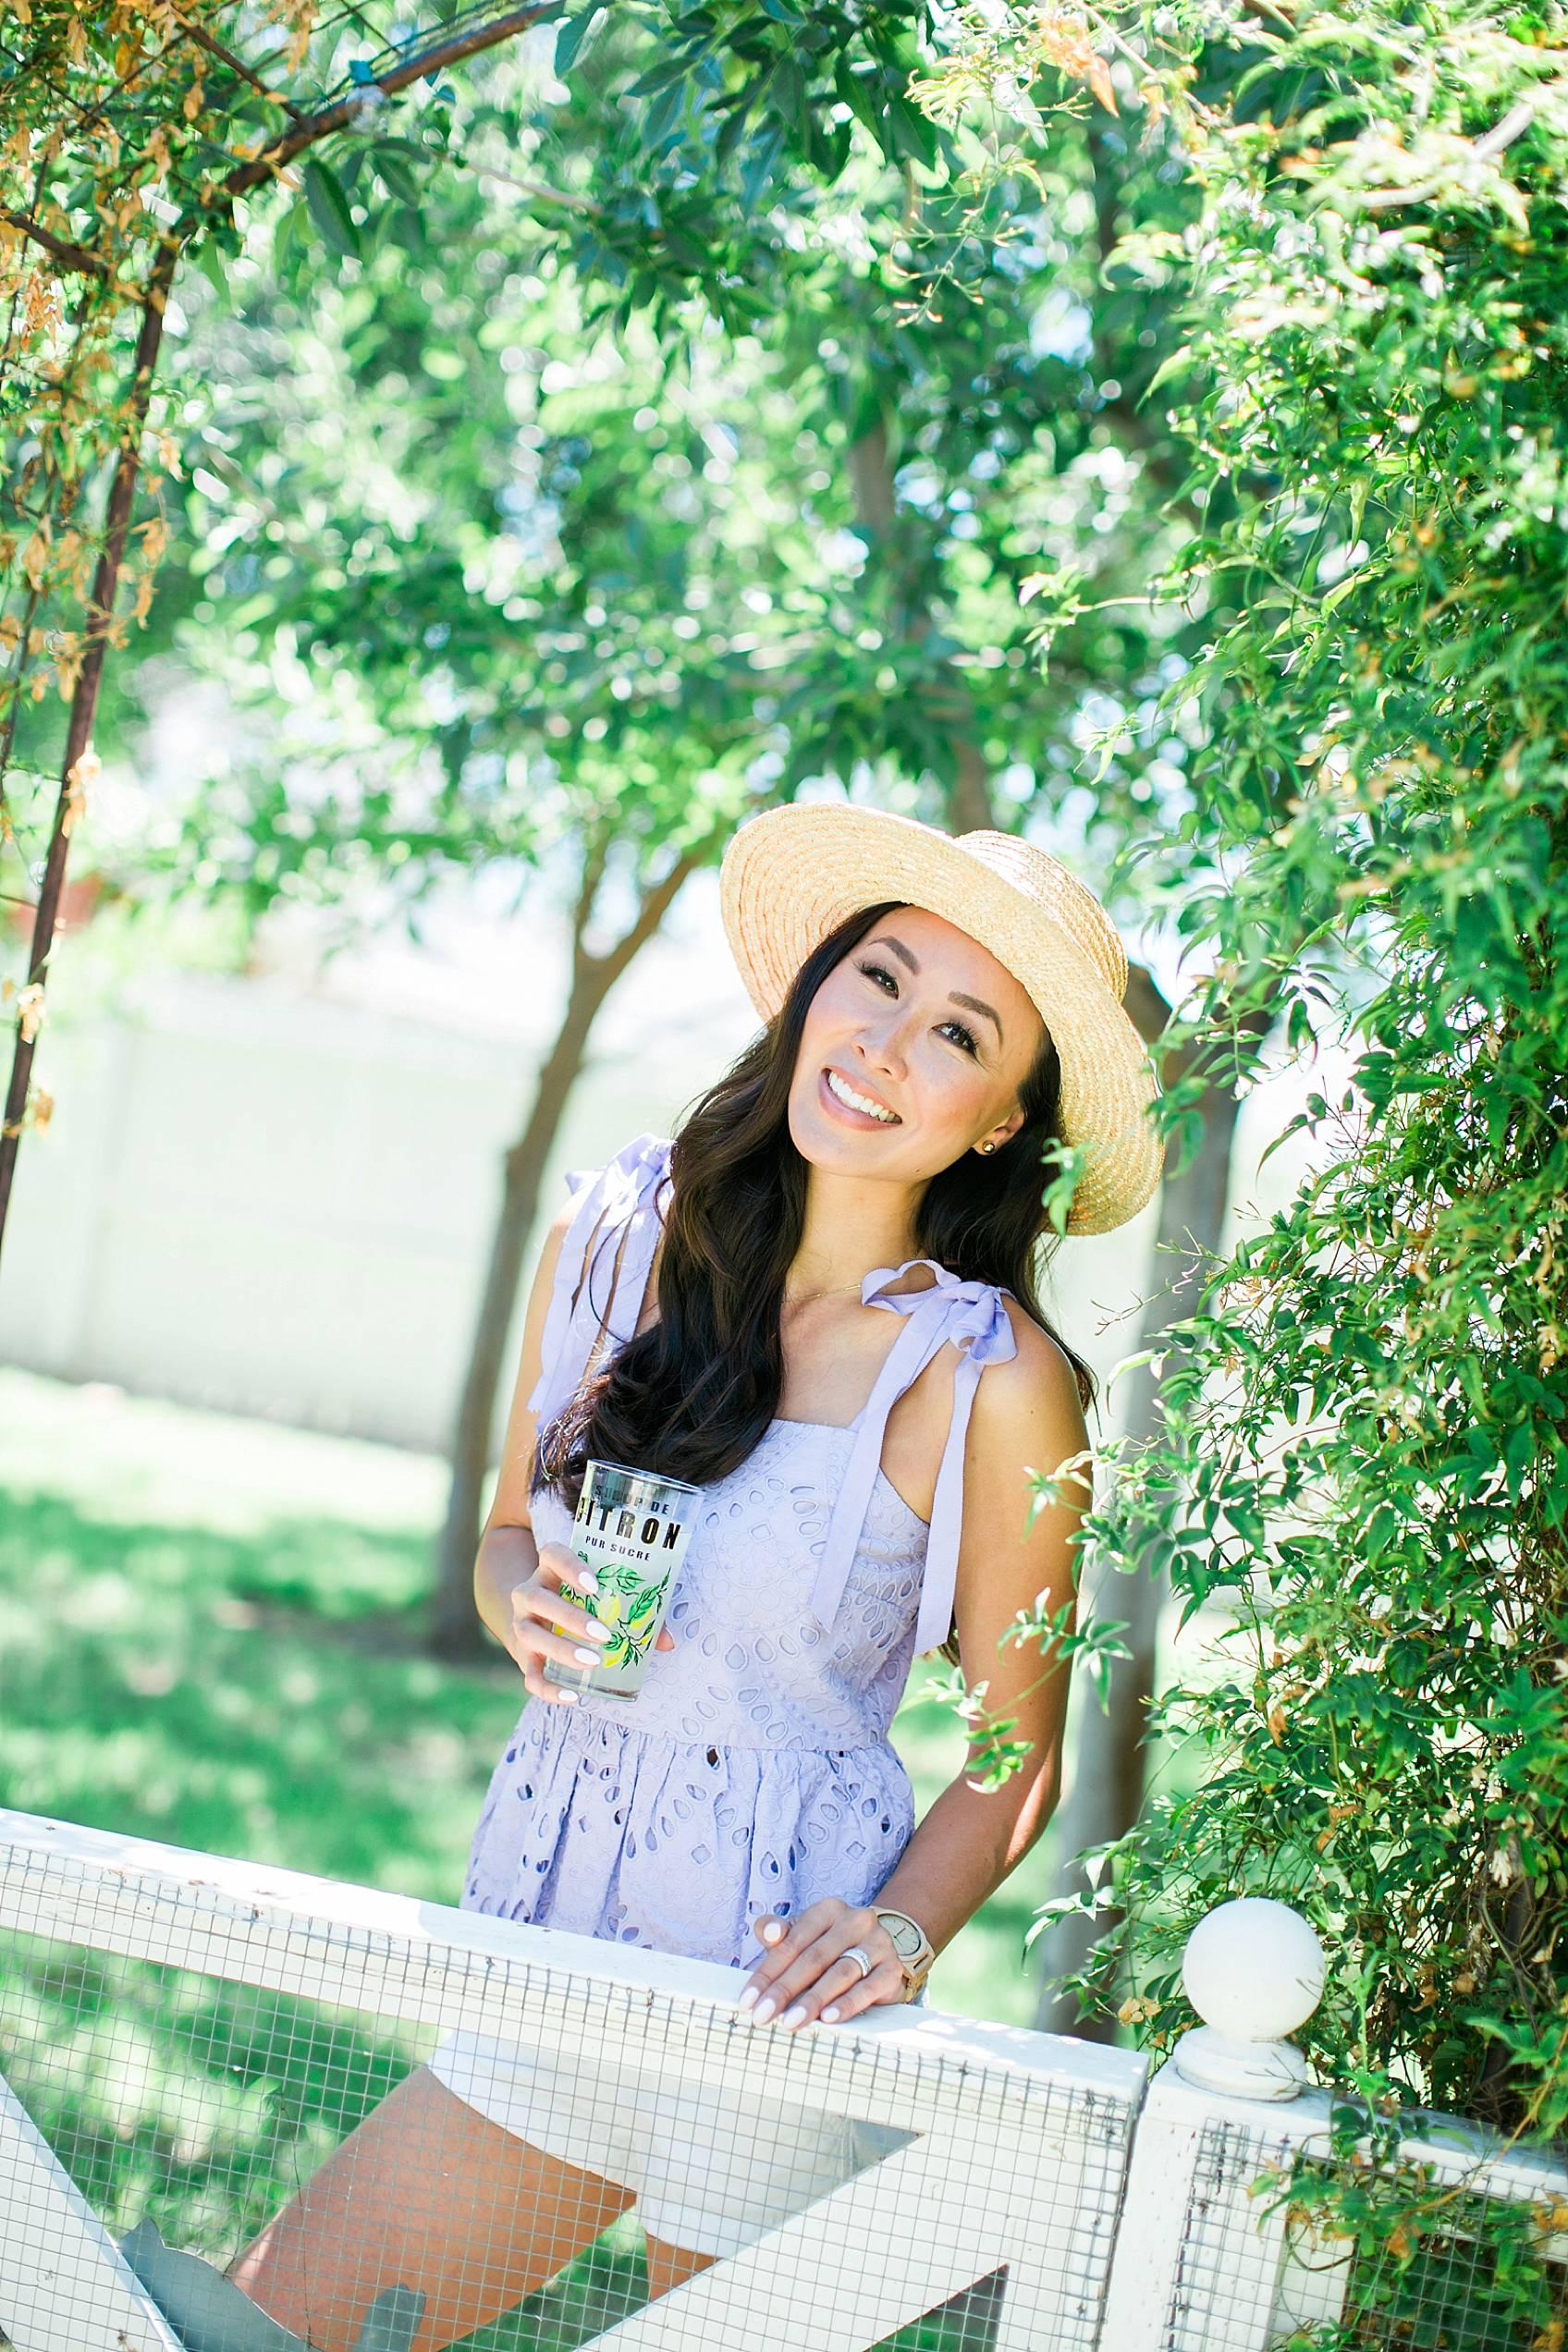 Lifestyle blogger diana elizabeth in purple eyelet top by j.crew in backyard jasmine vine wall holding glass of lemonade